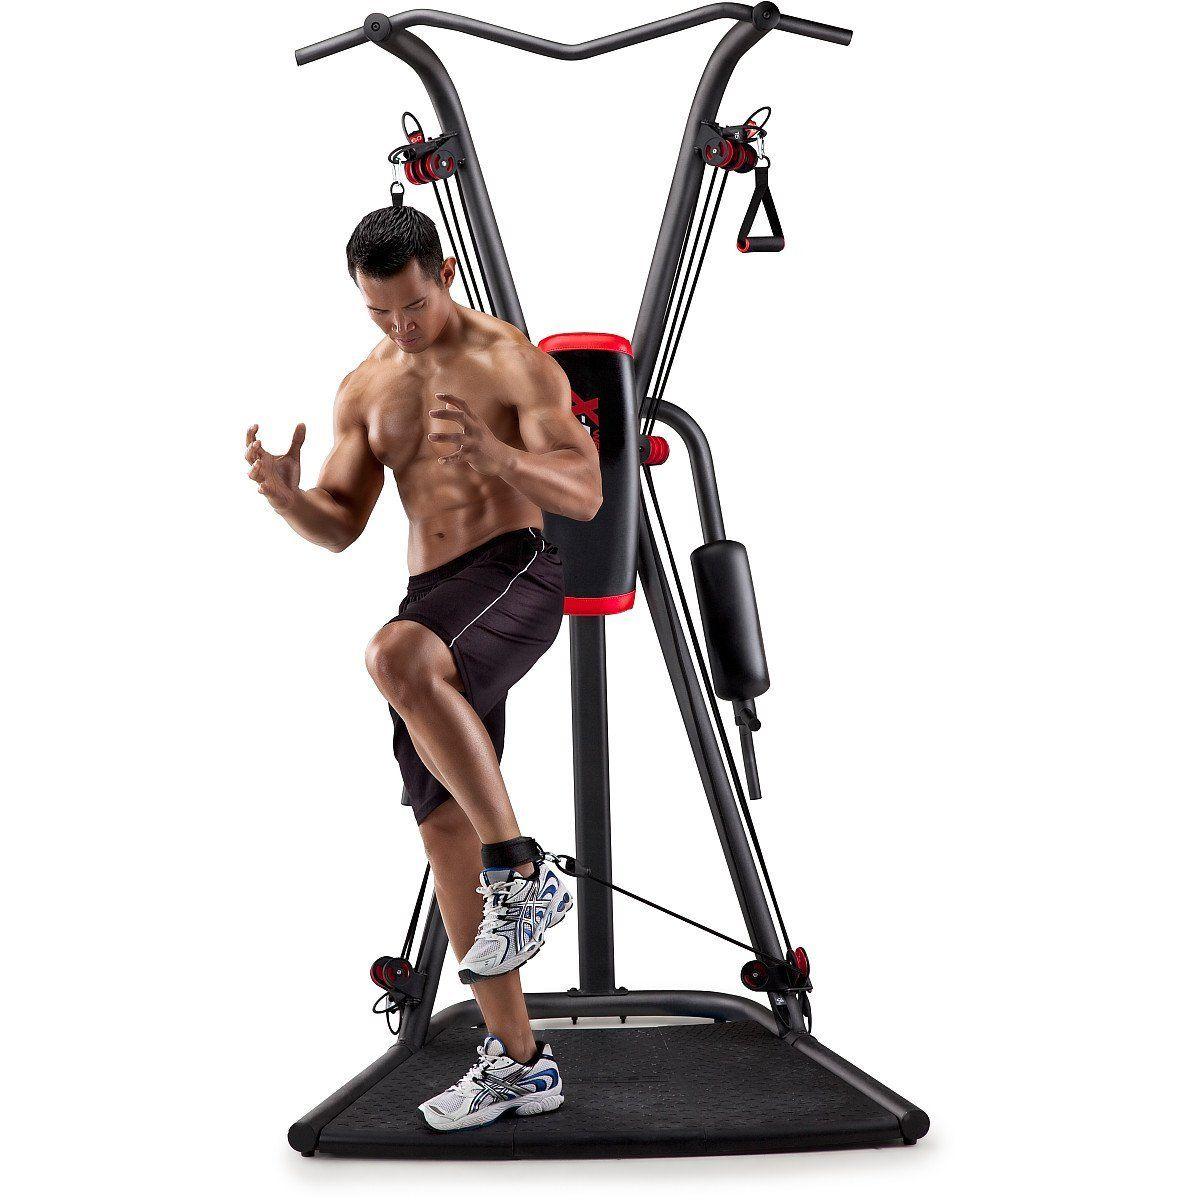 Weider factor plus home gym fold away vertical knee